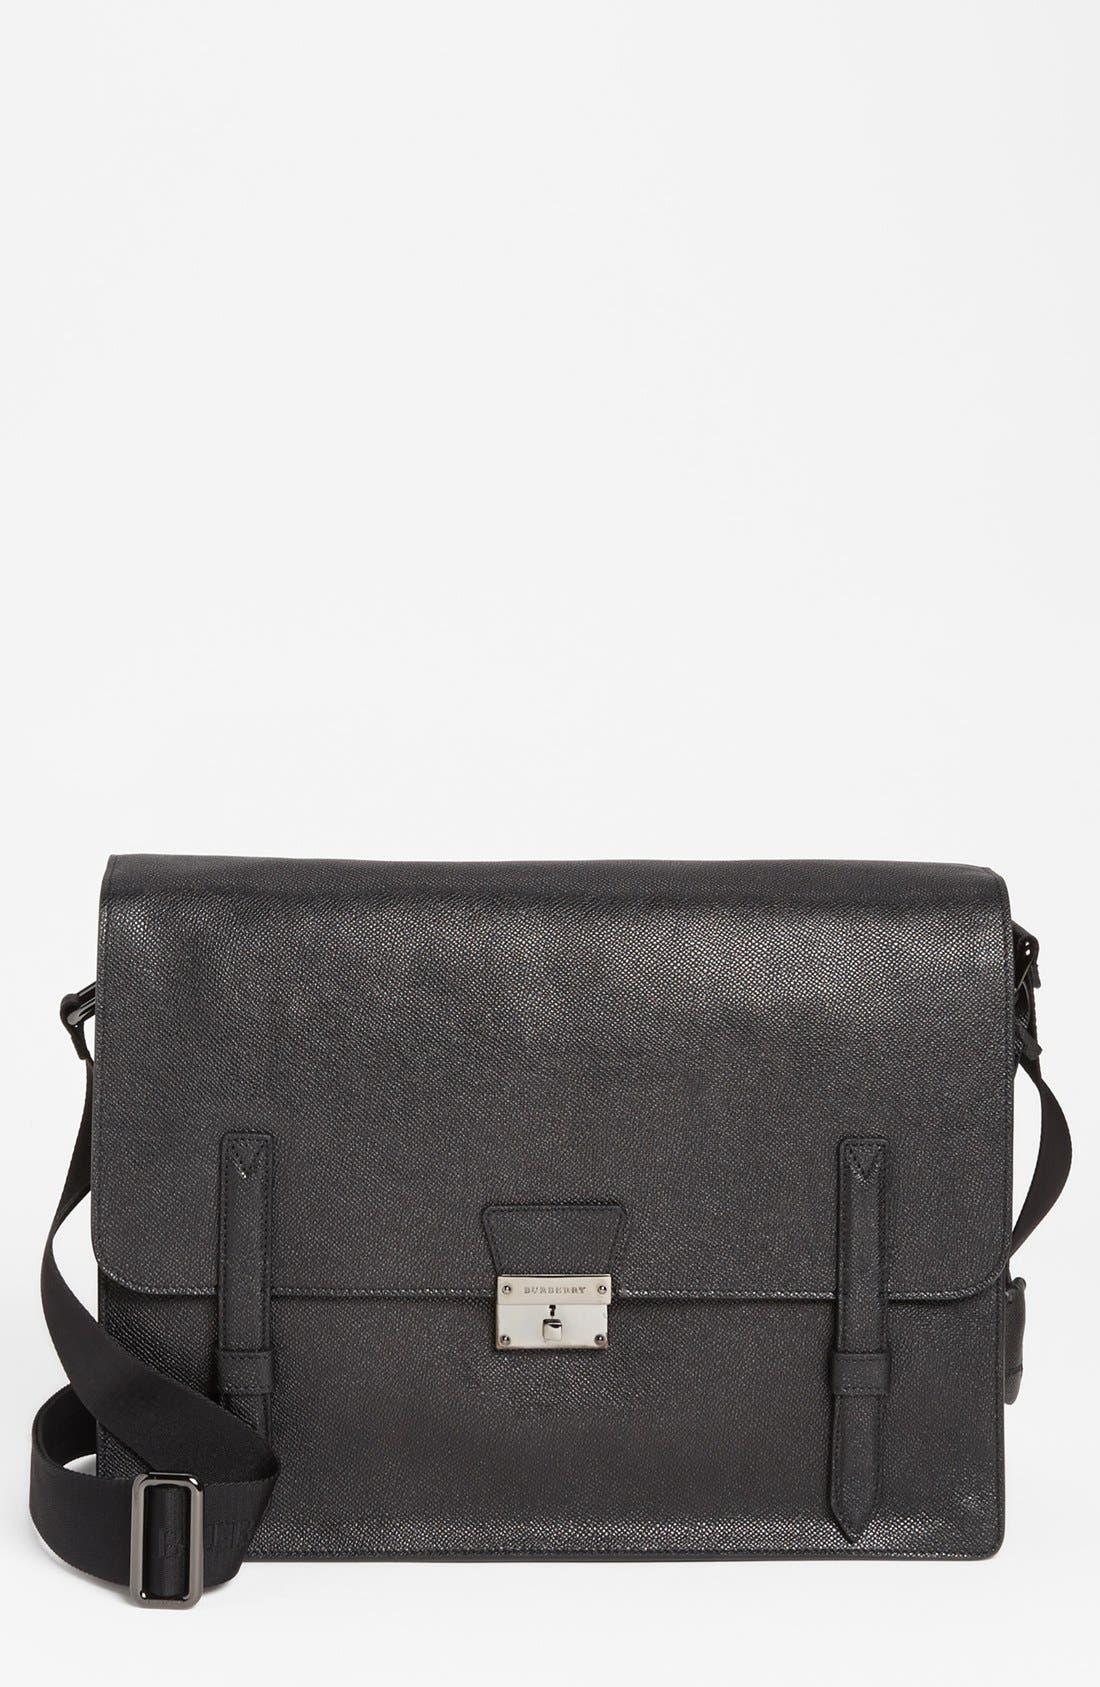 Alternate Image 1 Selected - Burberry 'Rivendale' Leather Messenger Bag